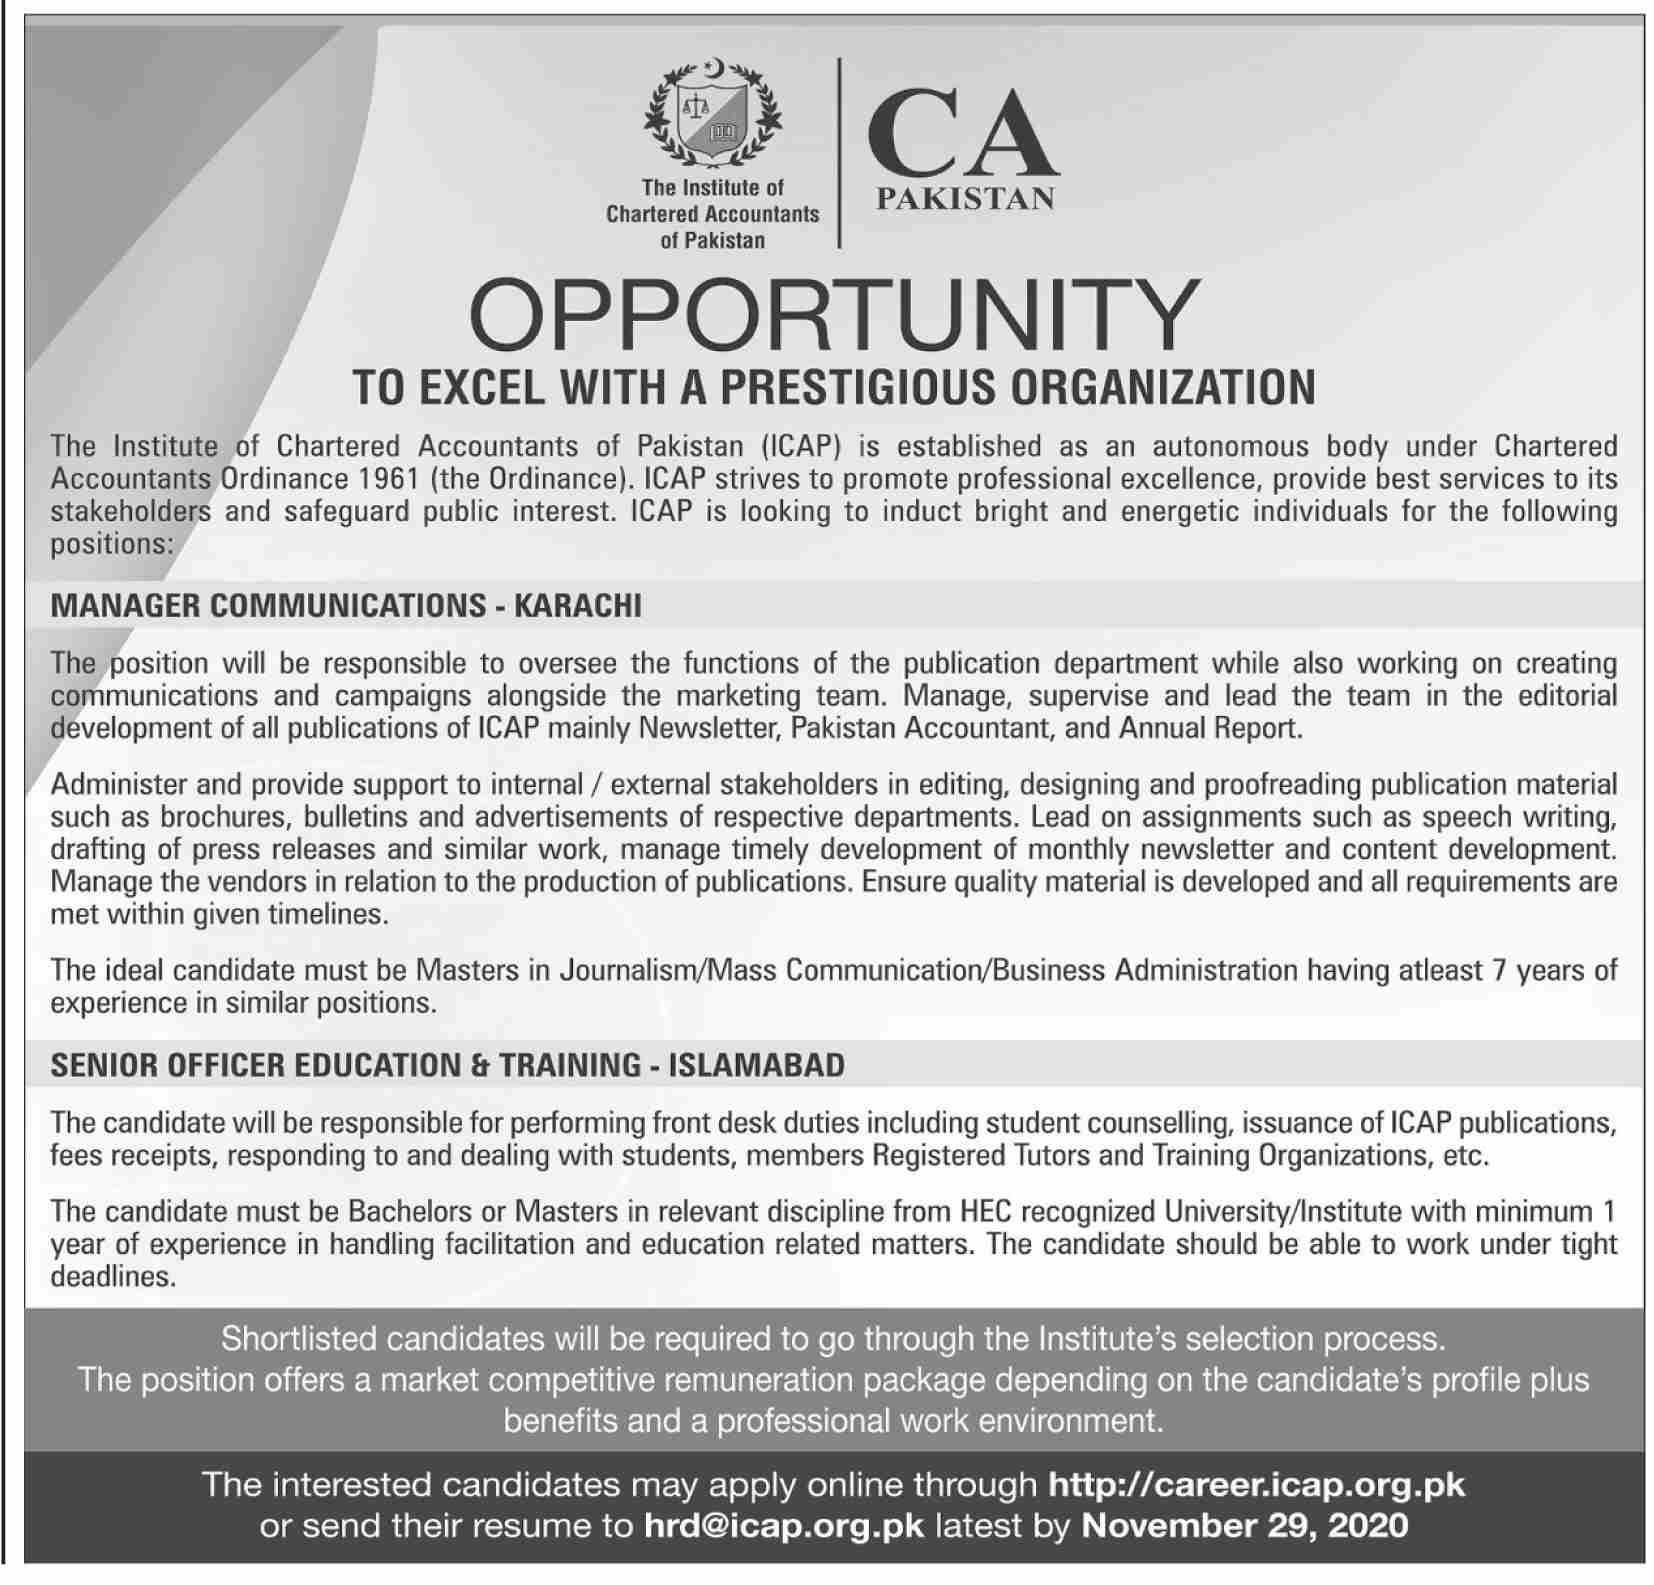 CA Pakistan ICAP Karachi Jobs 2020